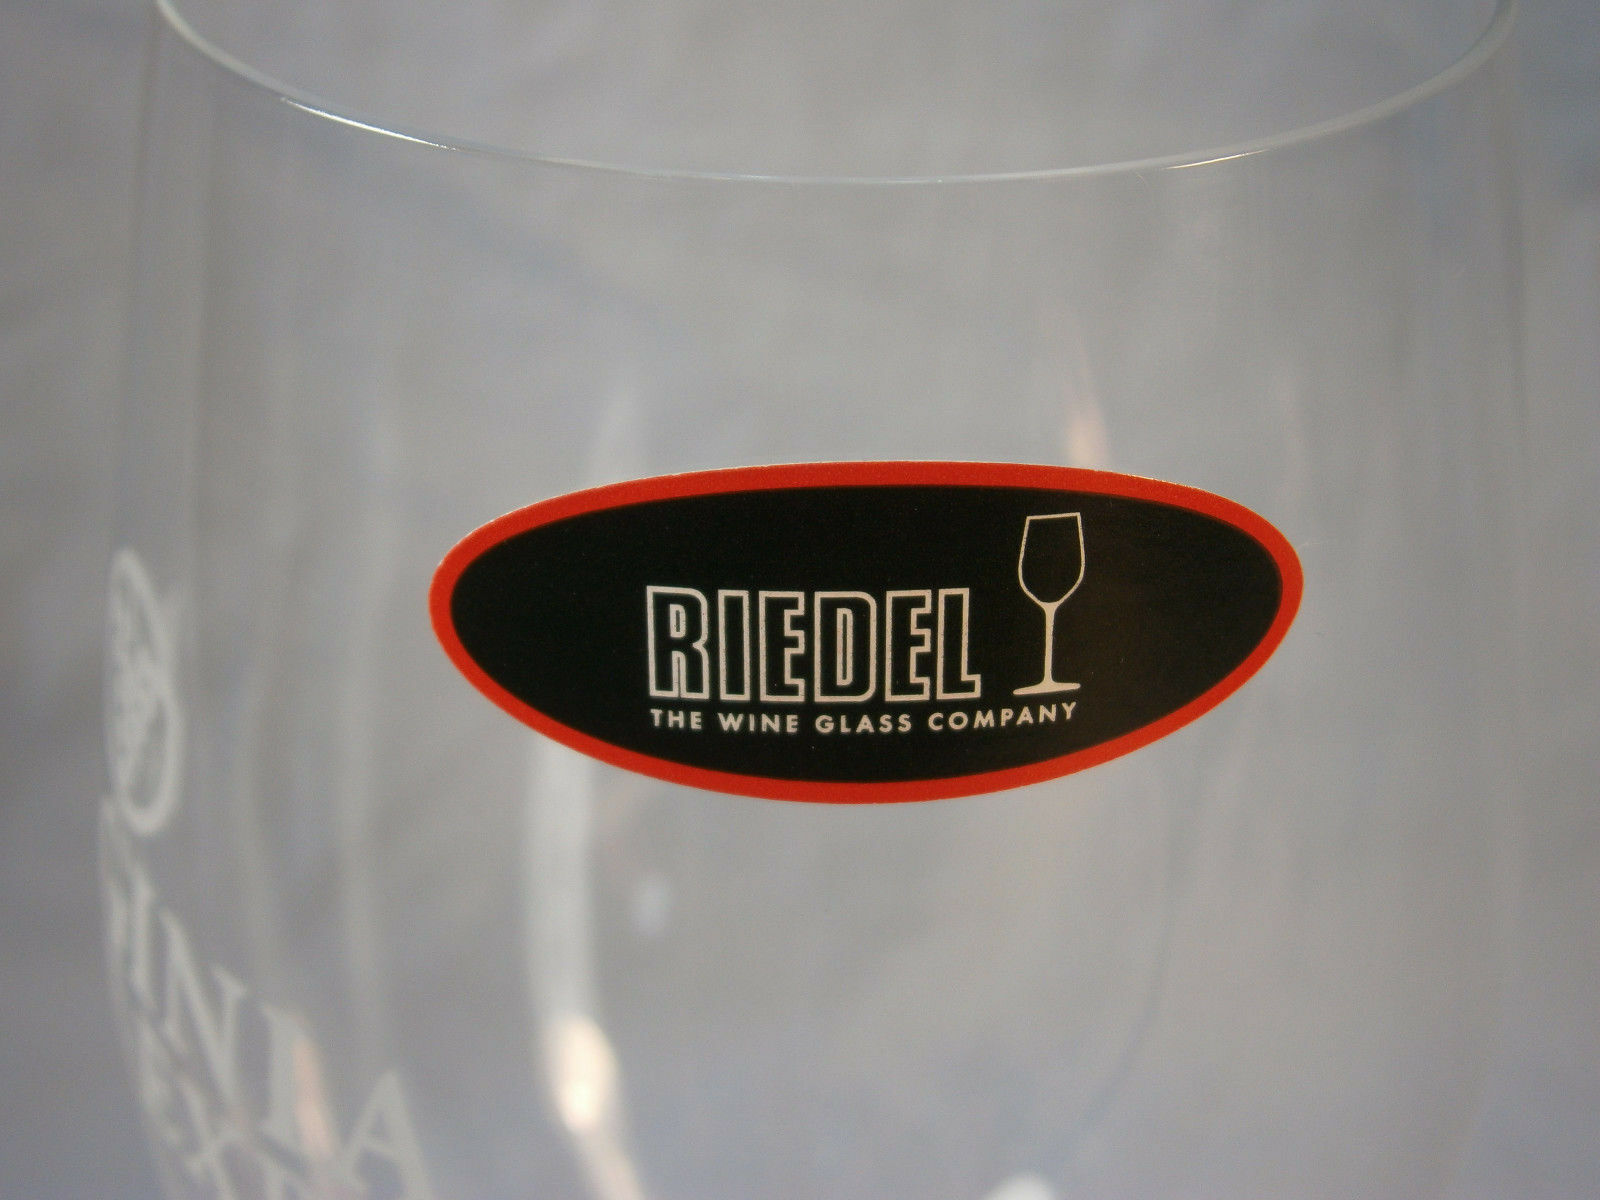 Lot 12 RIEDEL vin tige verre gobelet degustazione AUSTRIA cristal Allemagne